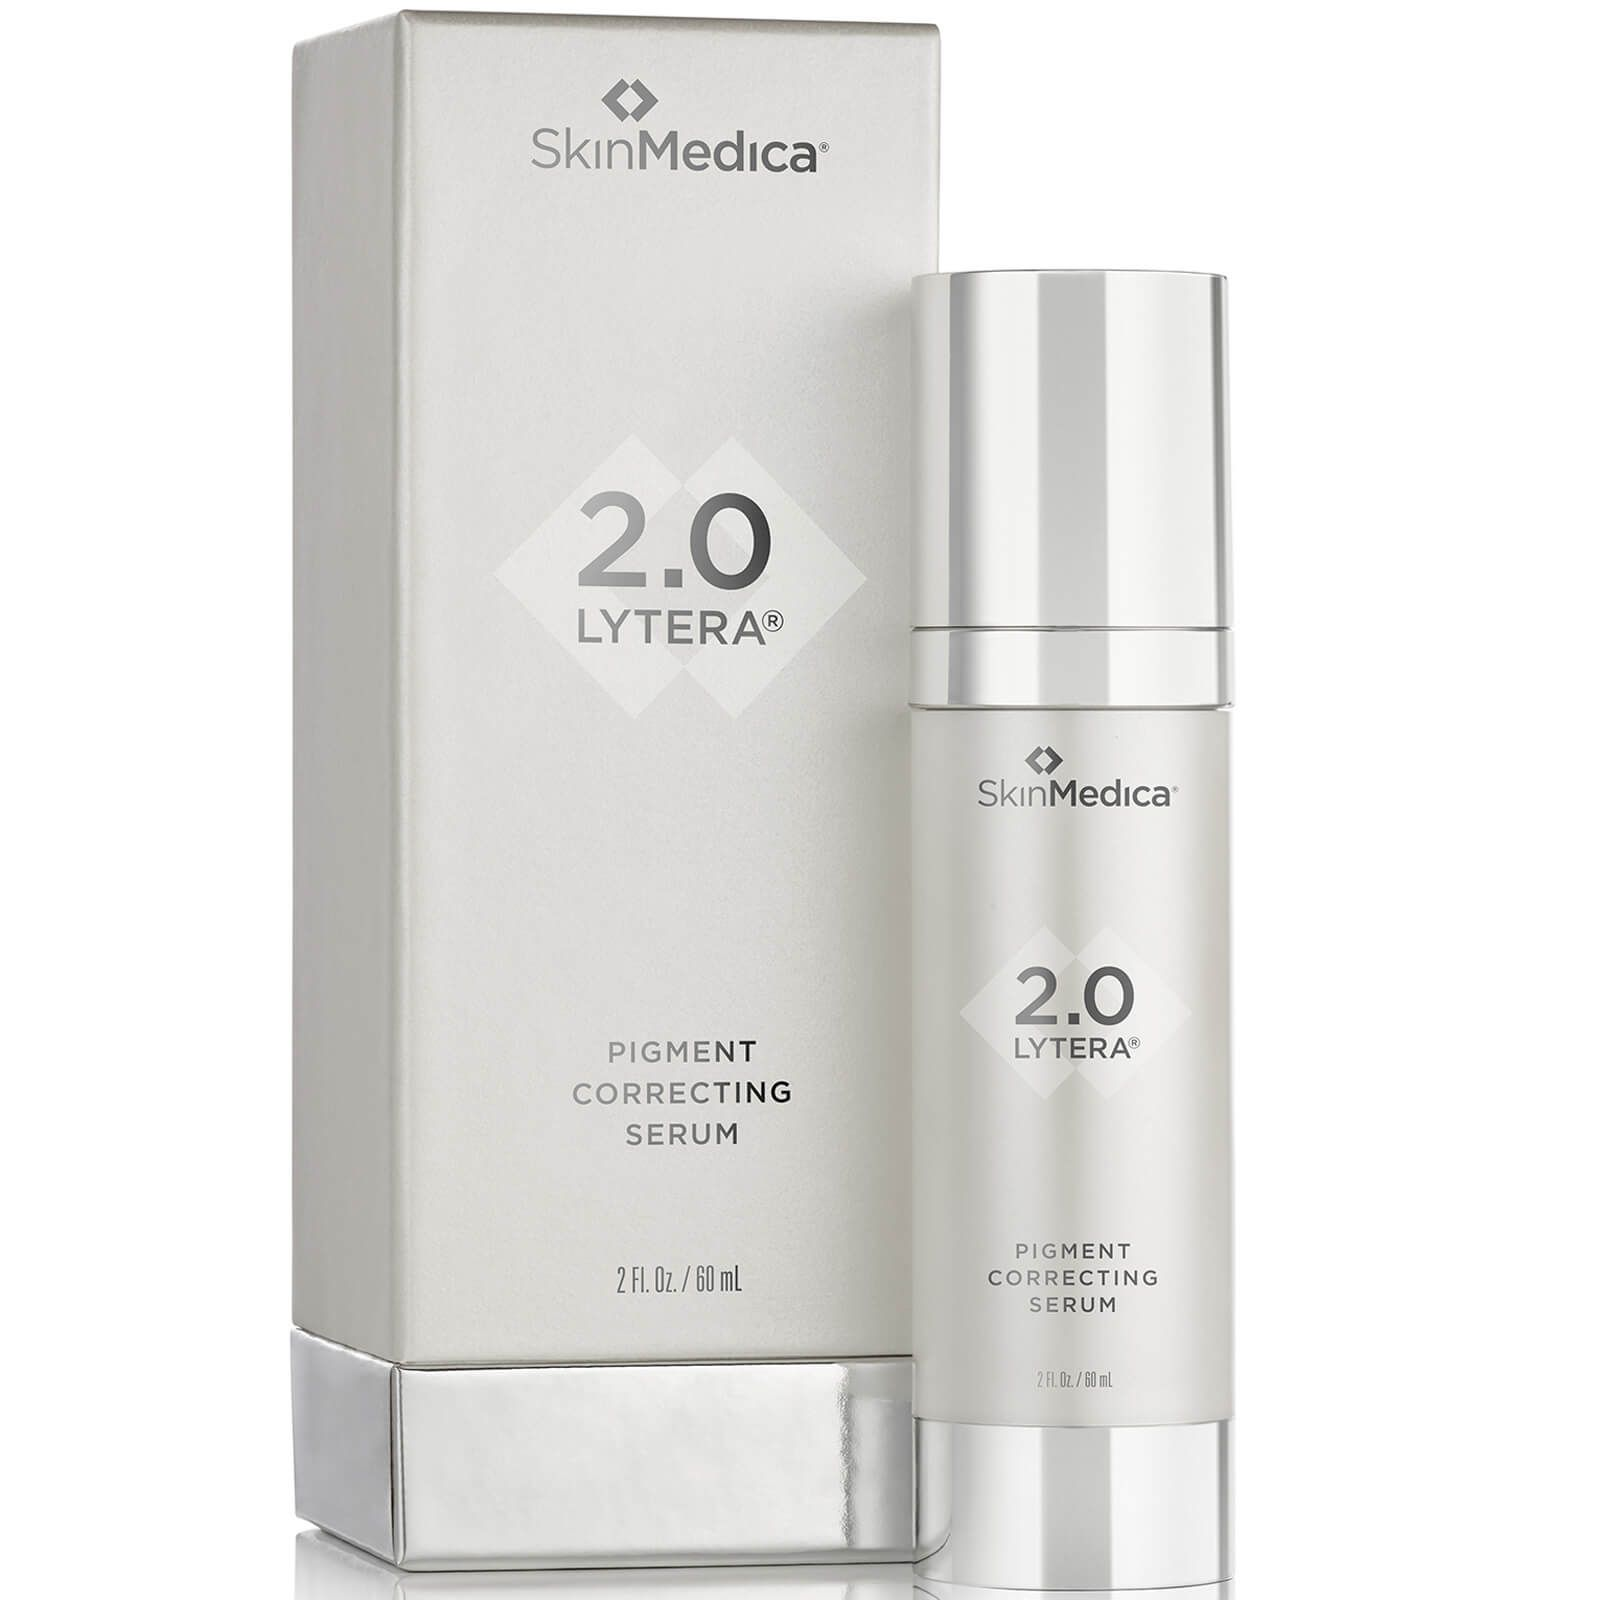 SkinMedica's Lytera 2.0 Pigment Correcting Serum